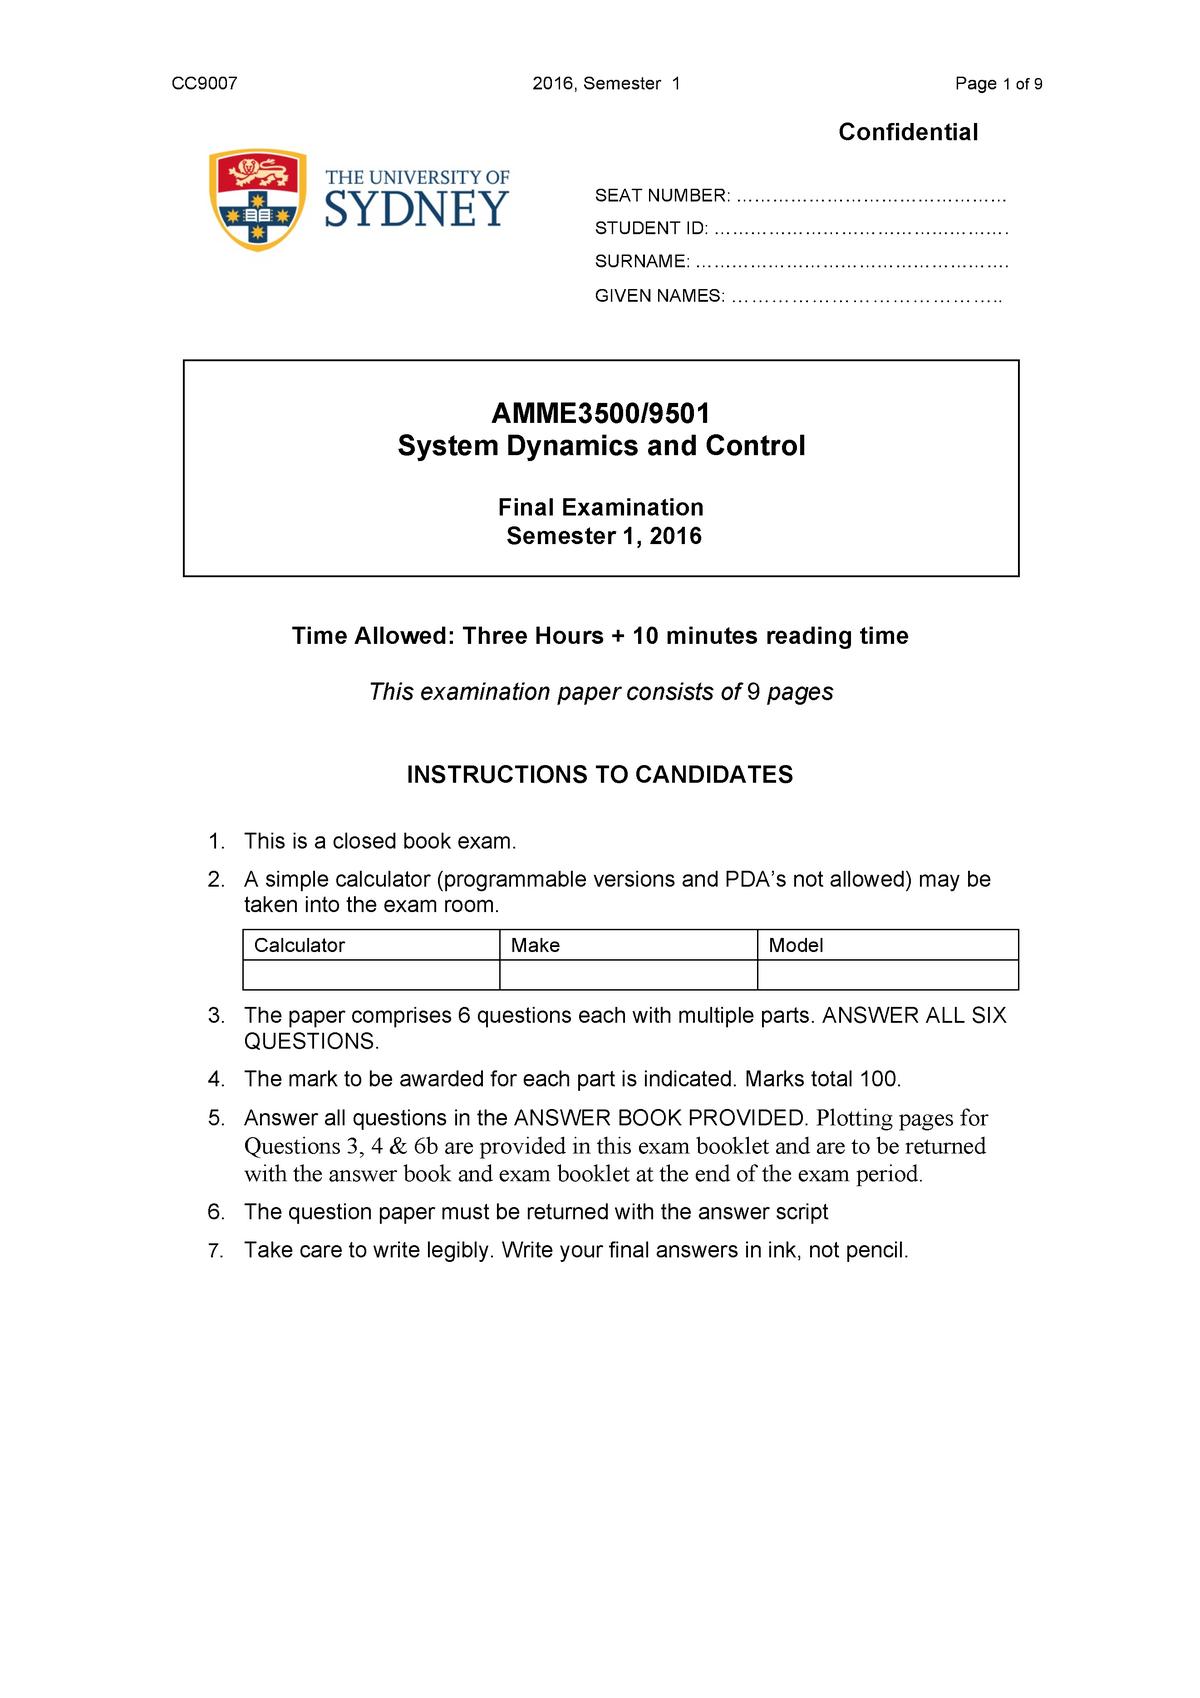 Exam 2016 - AMME3500: System Dynamics and Control - StuDocu